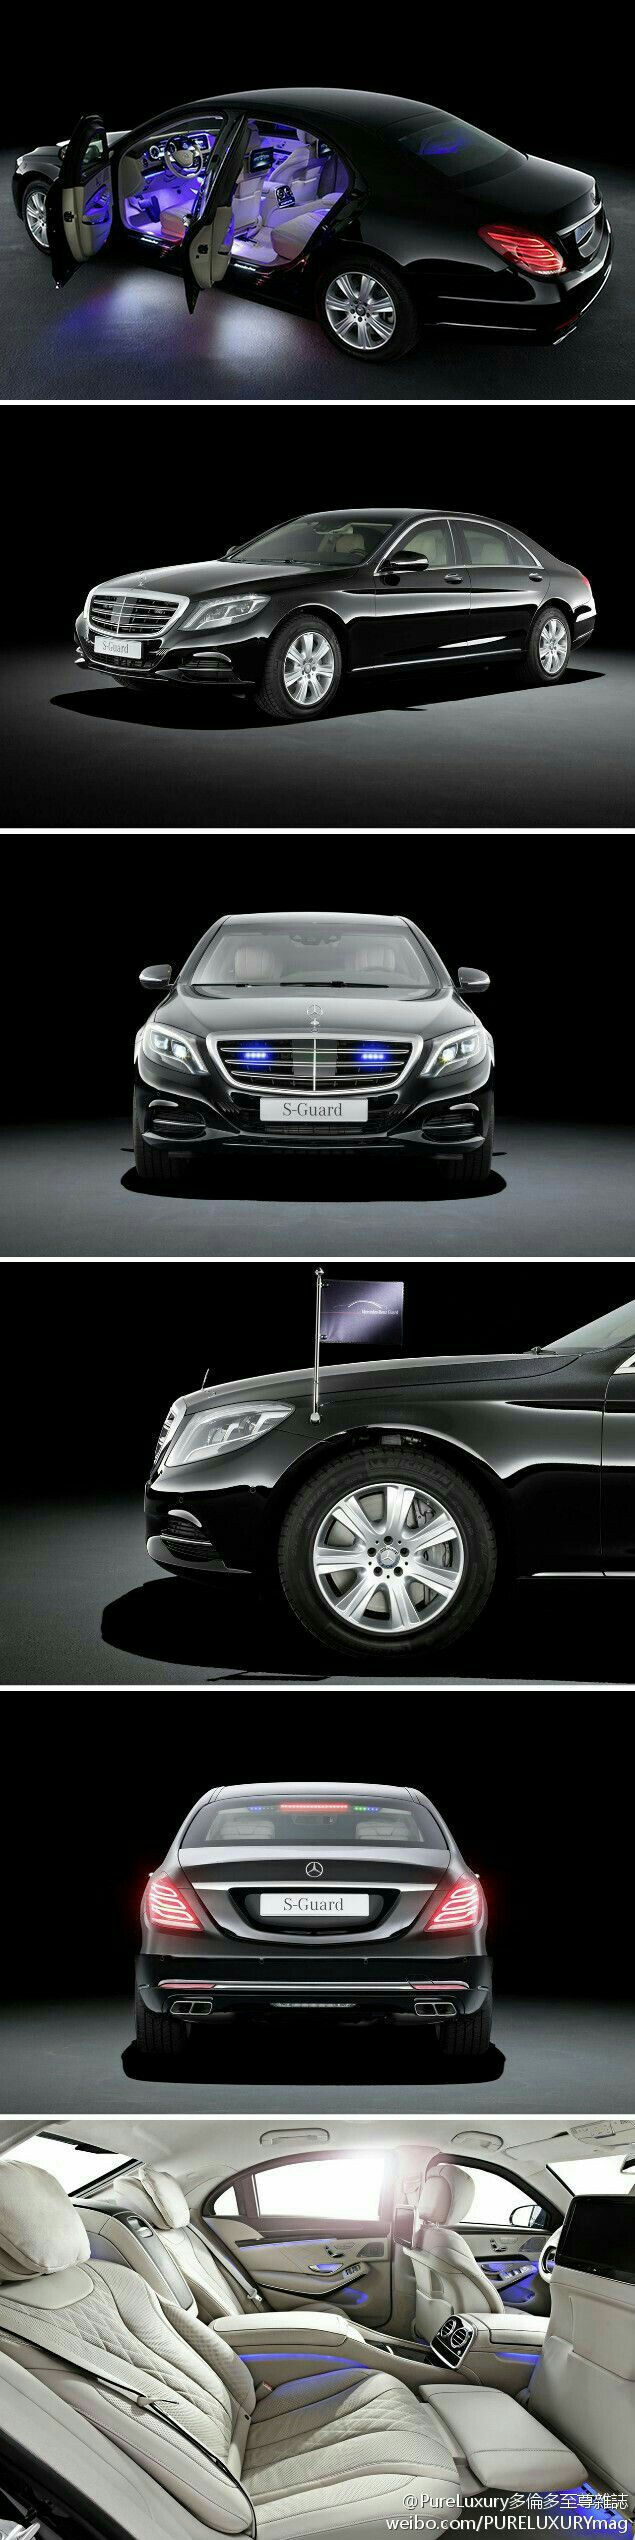 Mercedes Benz S600 Guard   Security Vehicles   Pinterest ...